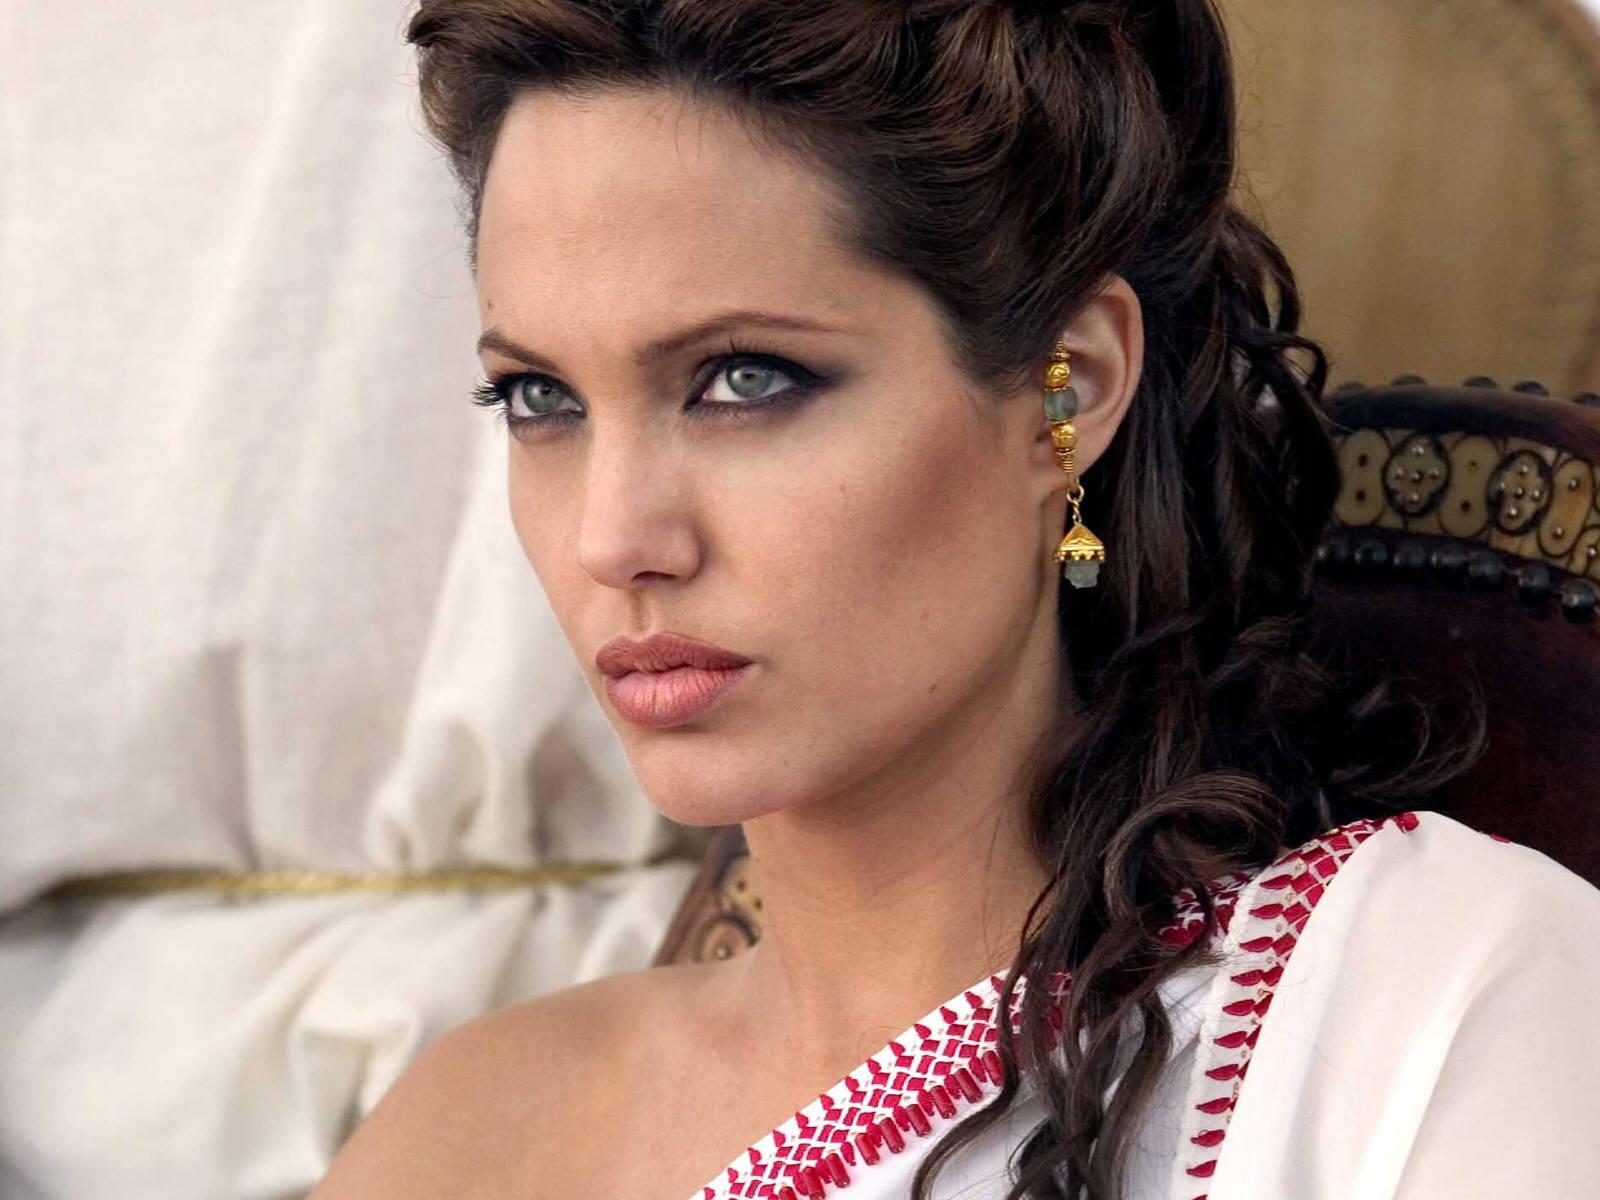 Angelina Jolie as Cleopatra